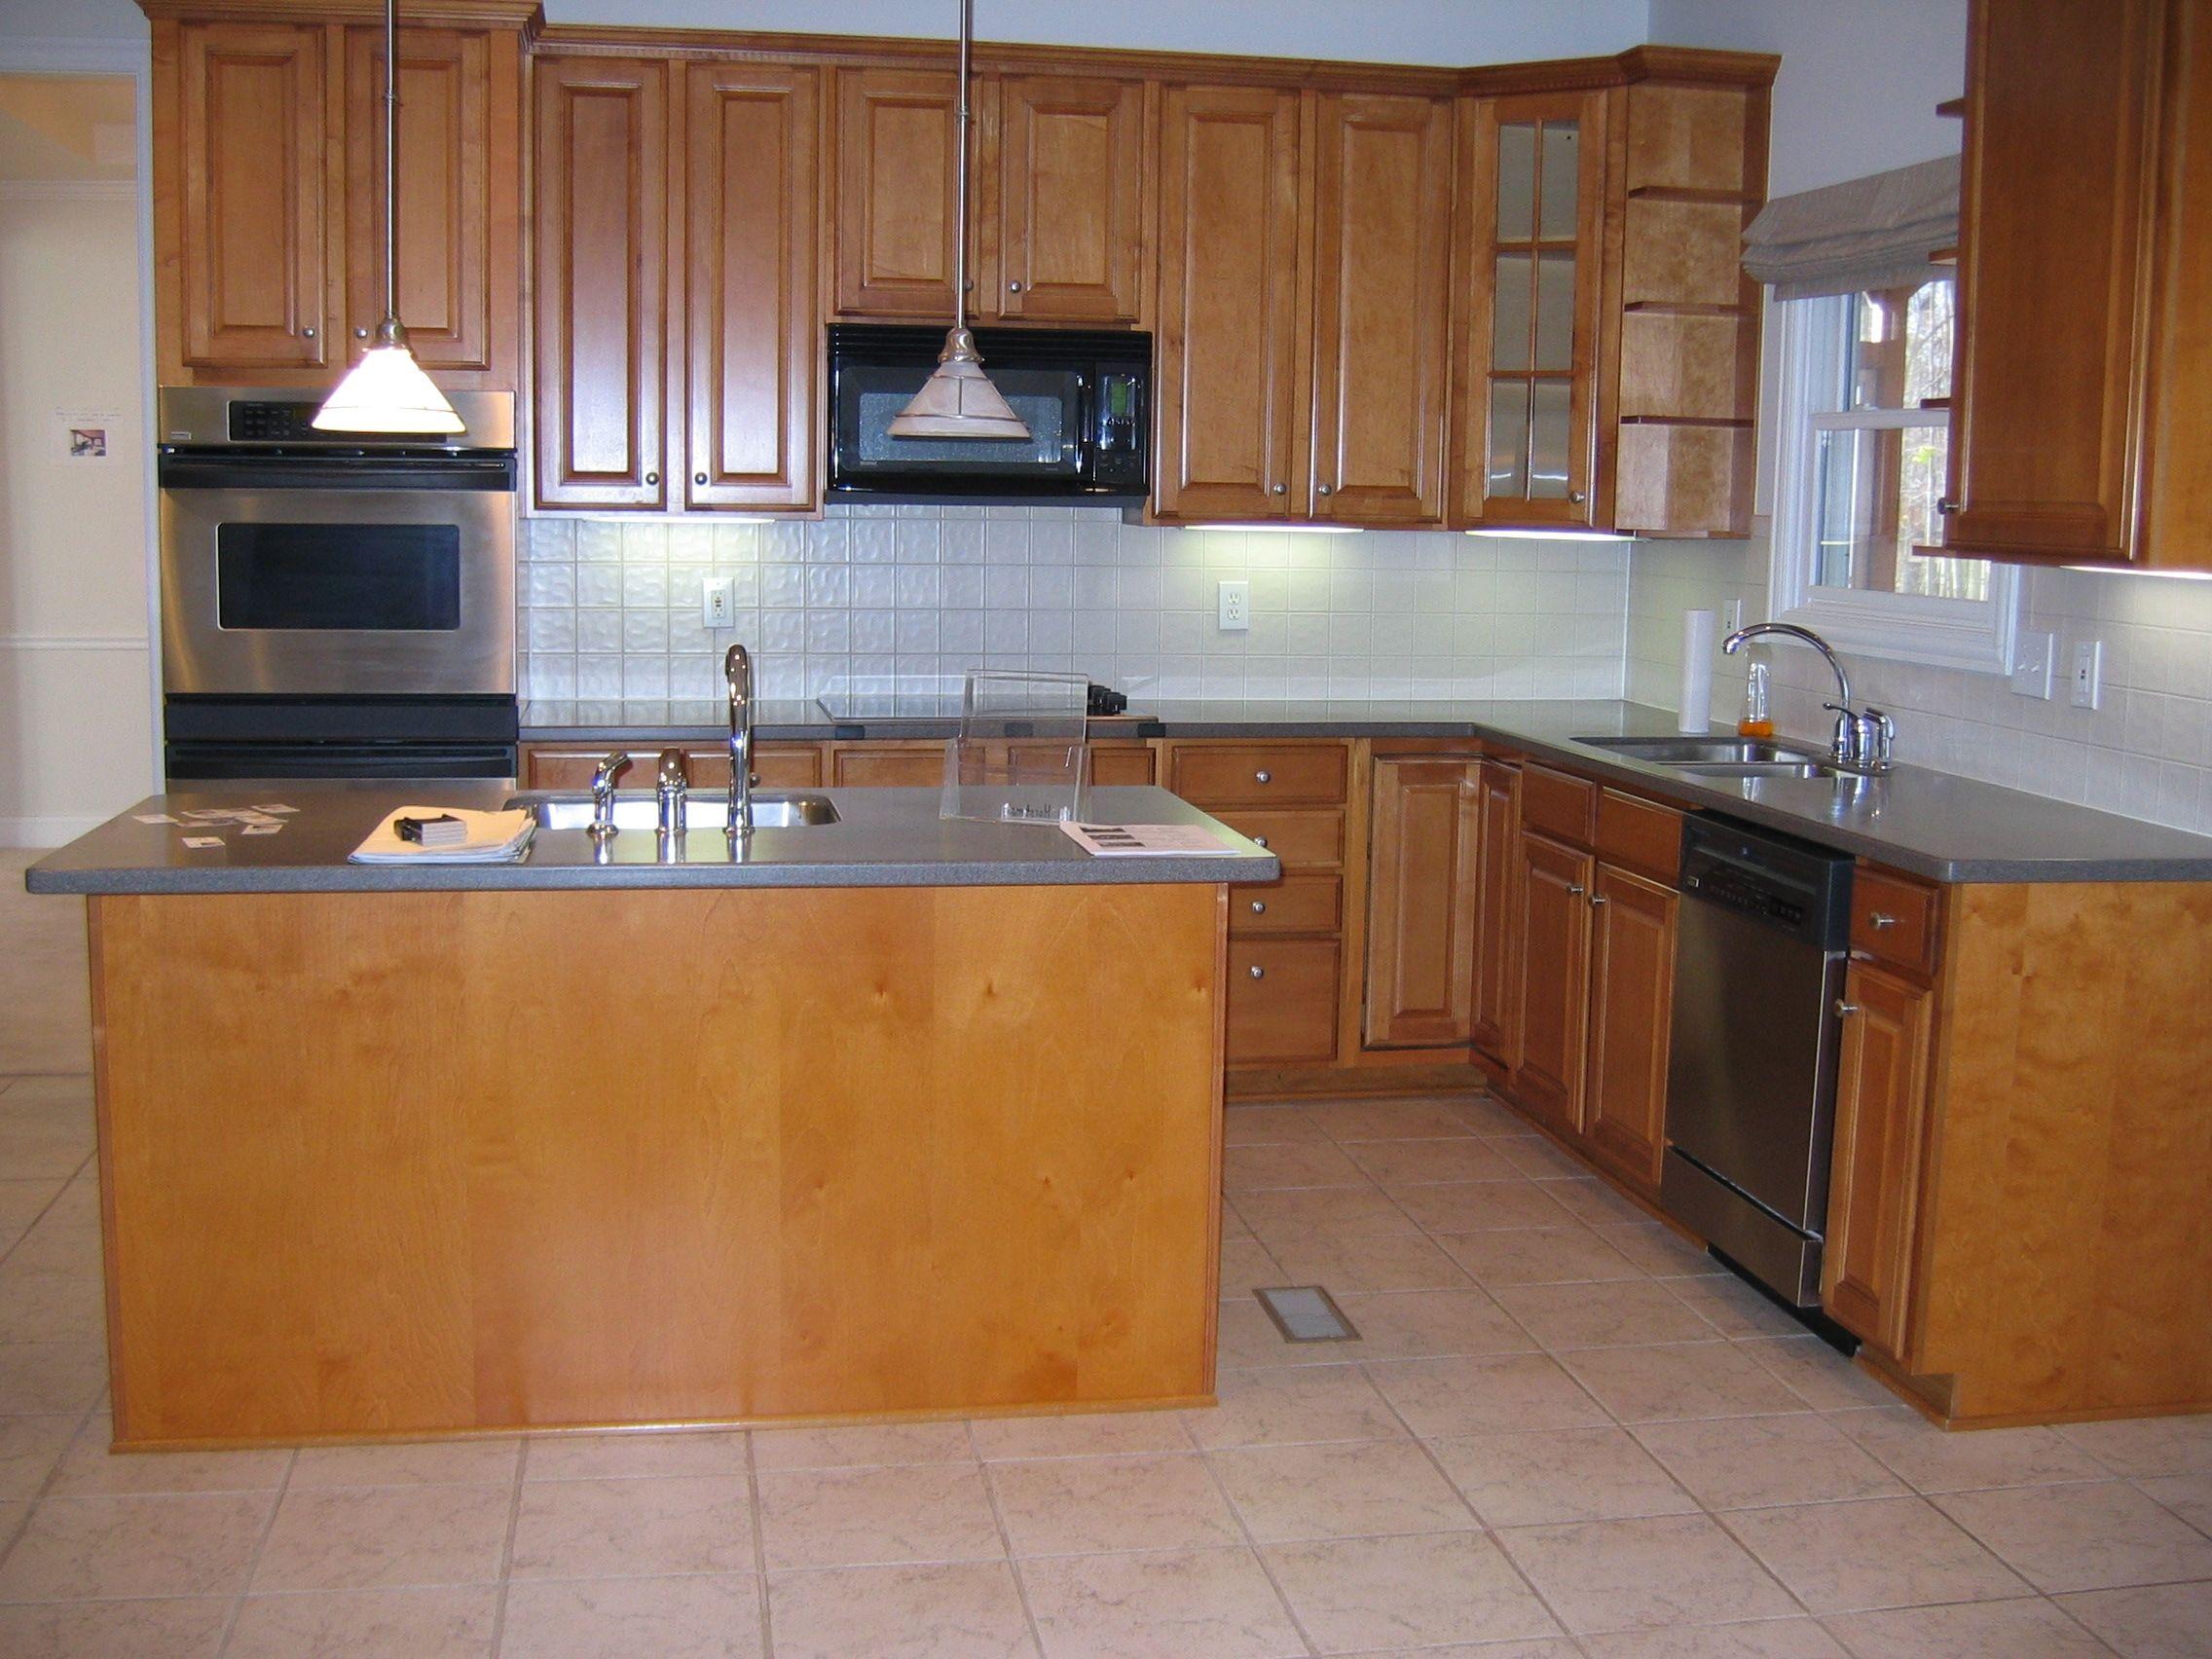 35 Best Idea About Lshaped Kitchen Designs Ideal Kitchen  Big New L Shaped Kitchen Island Design Ideas